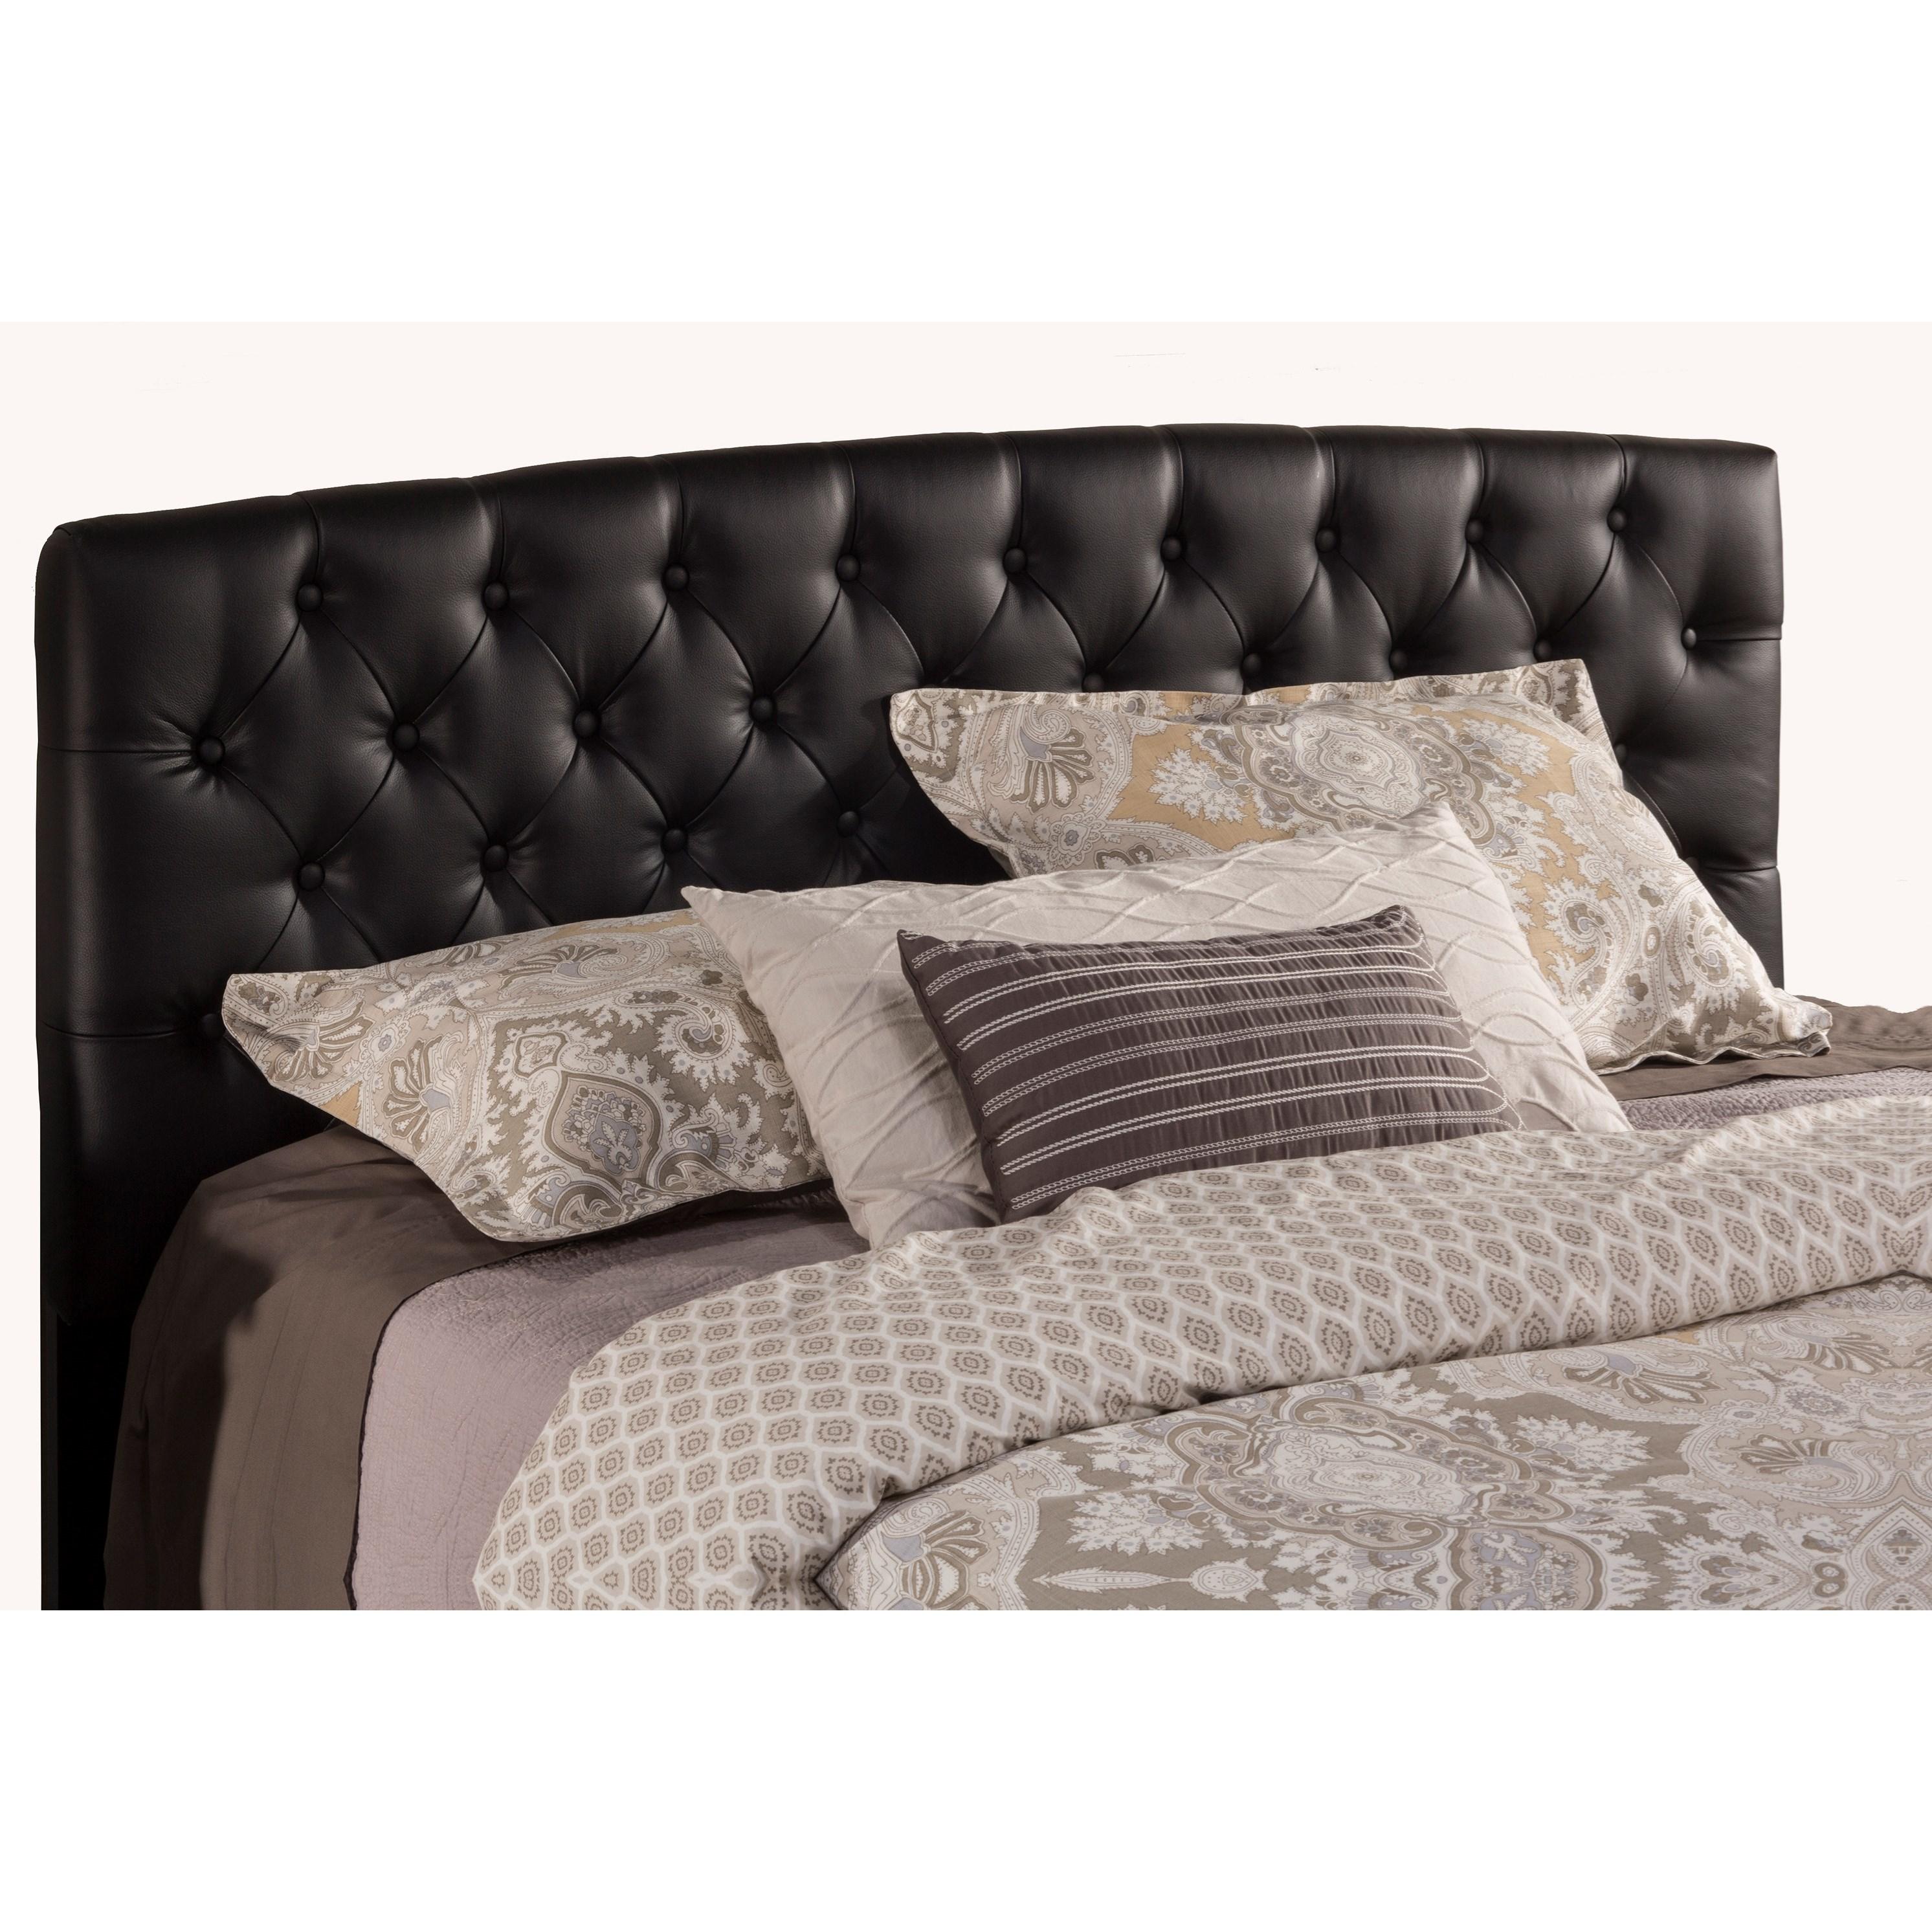 Hillsdale Upholstered Beds King/Cal King Headboard - Item Number: 1952BKF